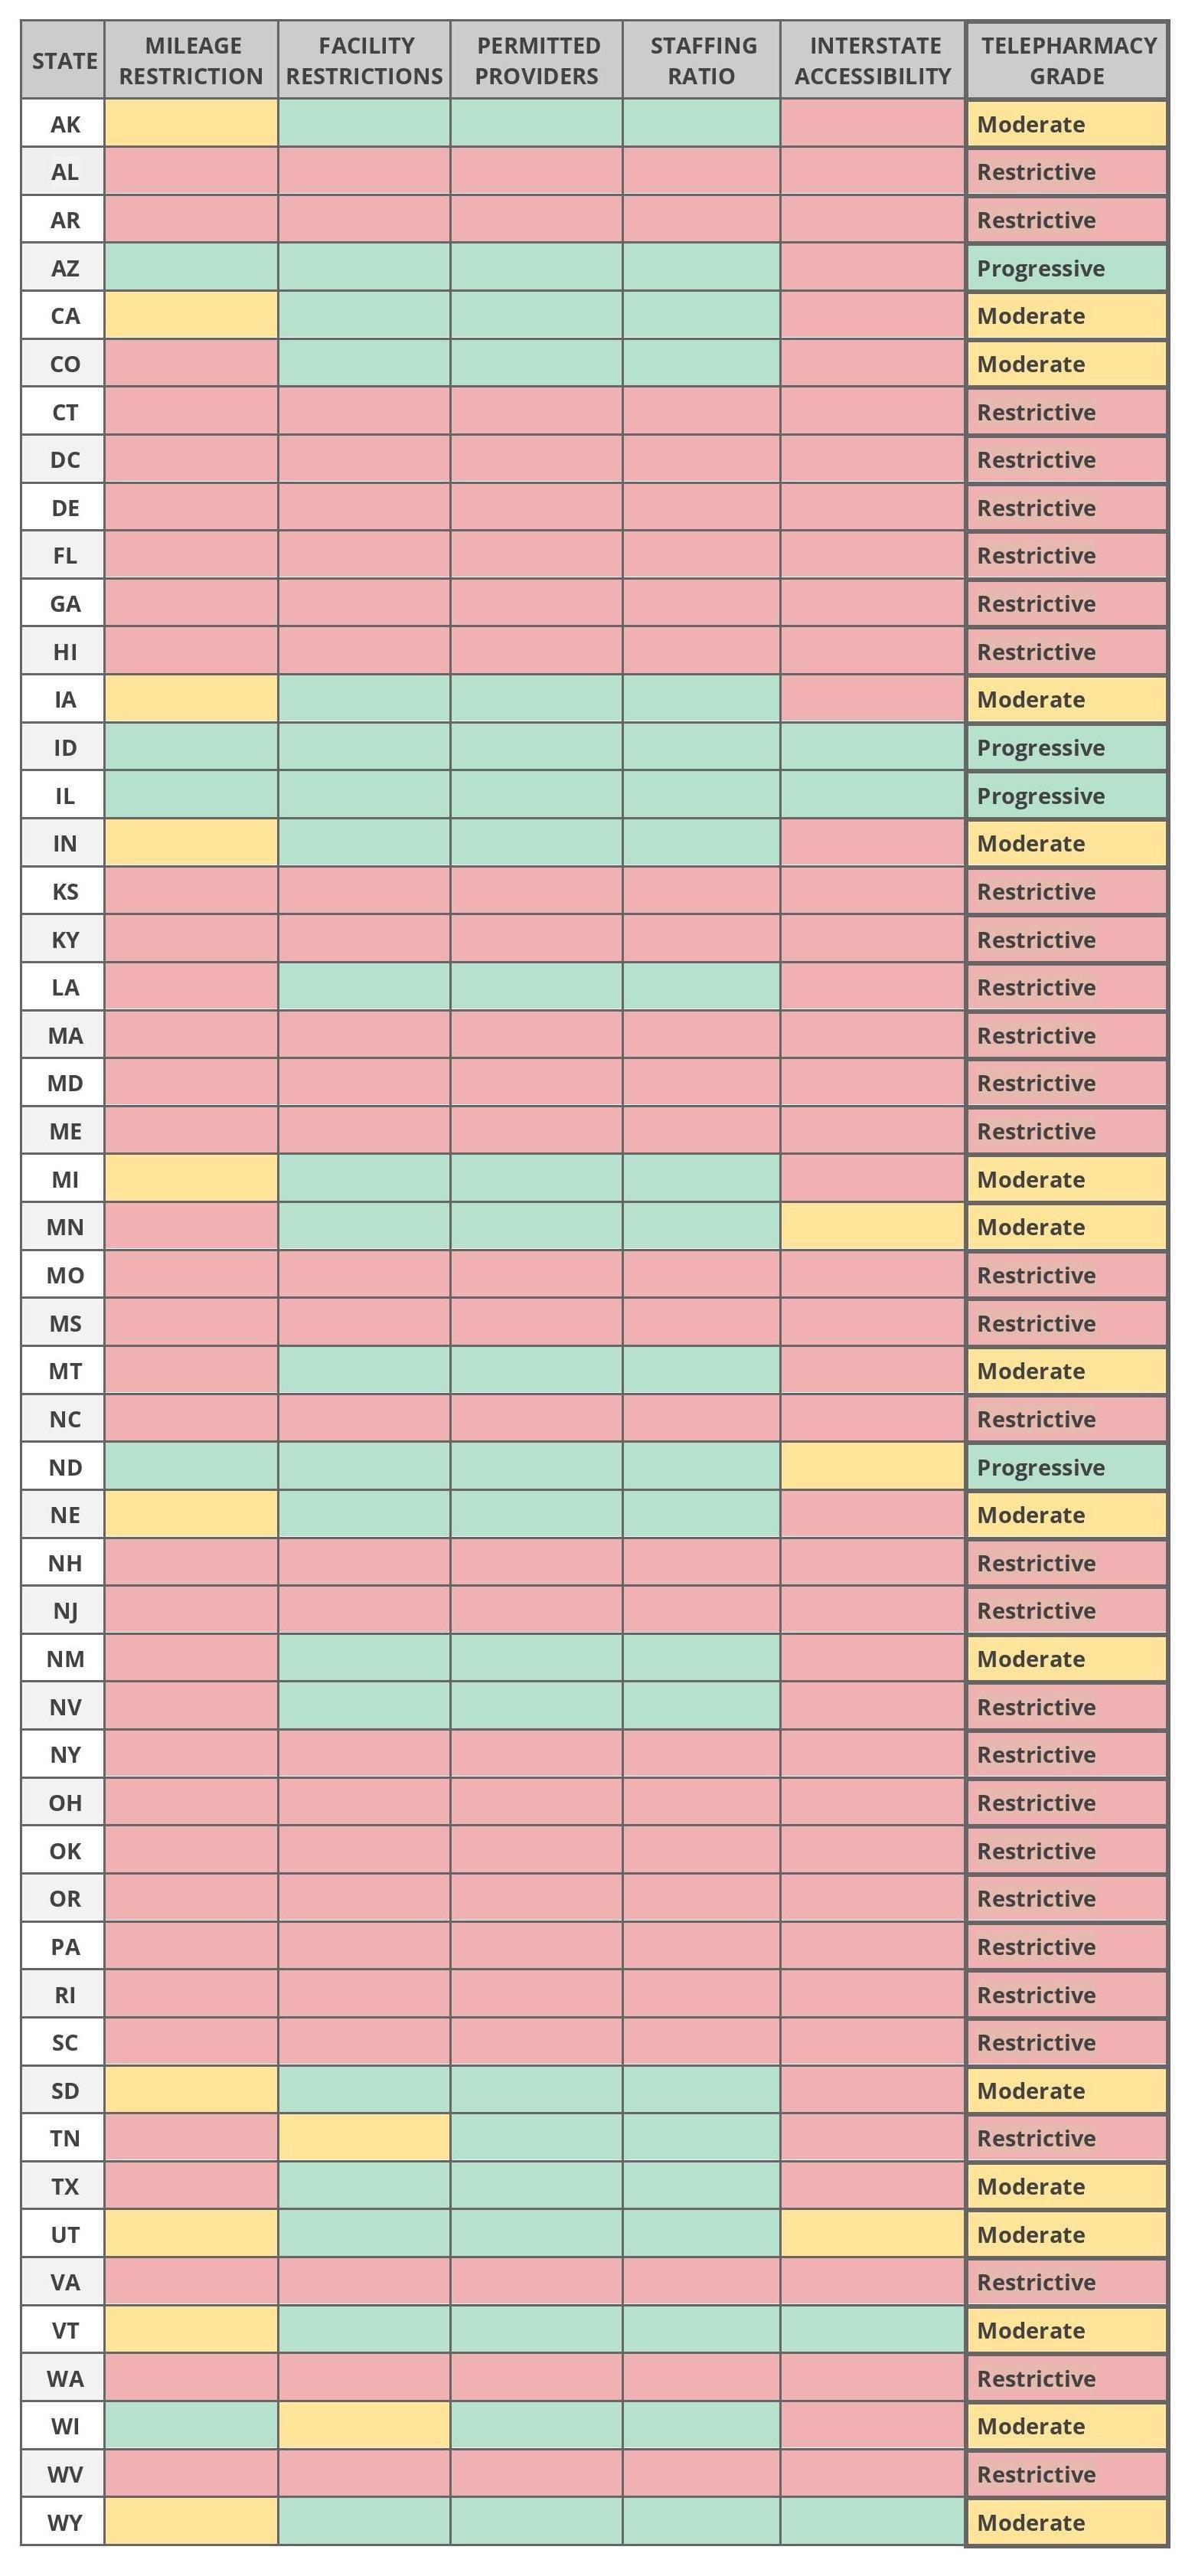 Regulatory Analysis Table